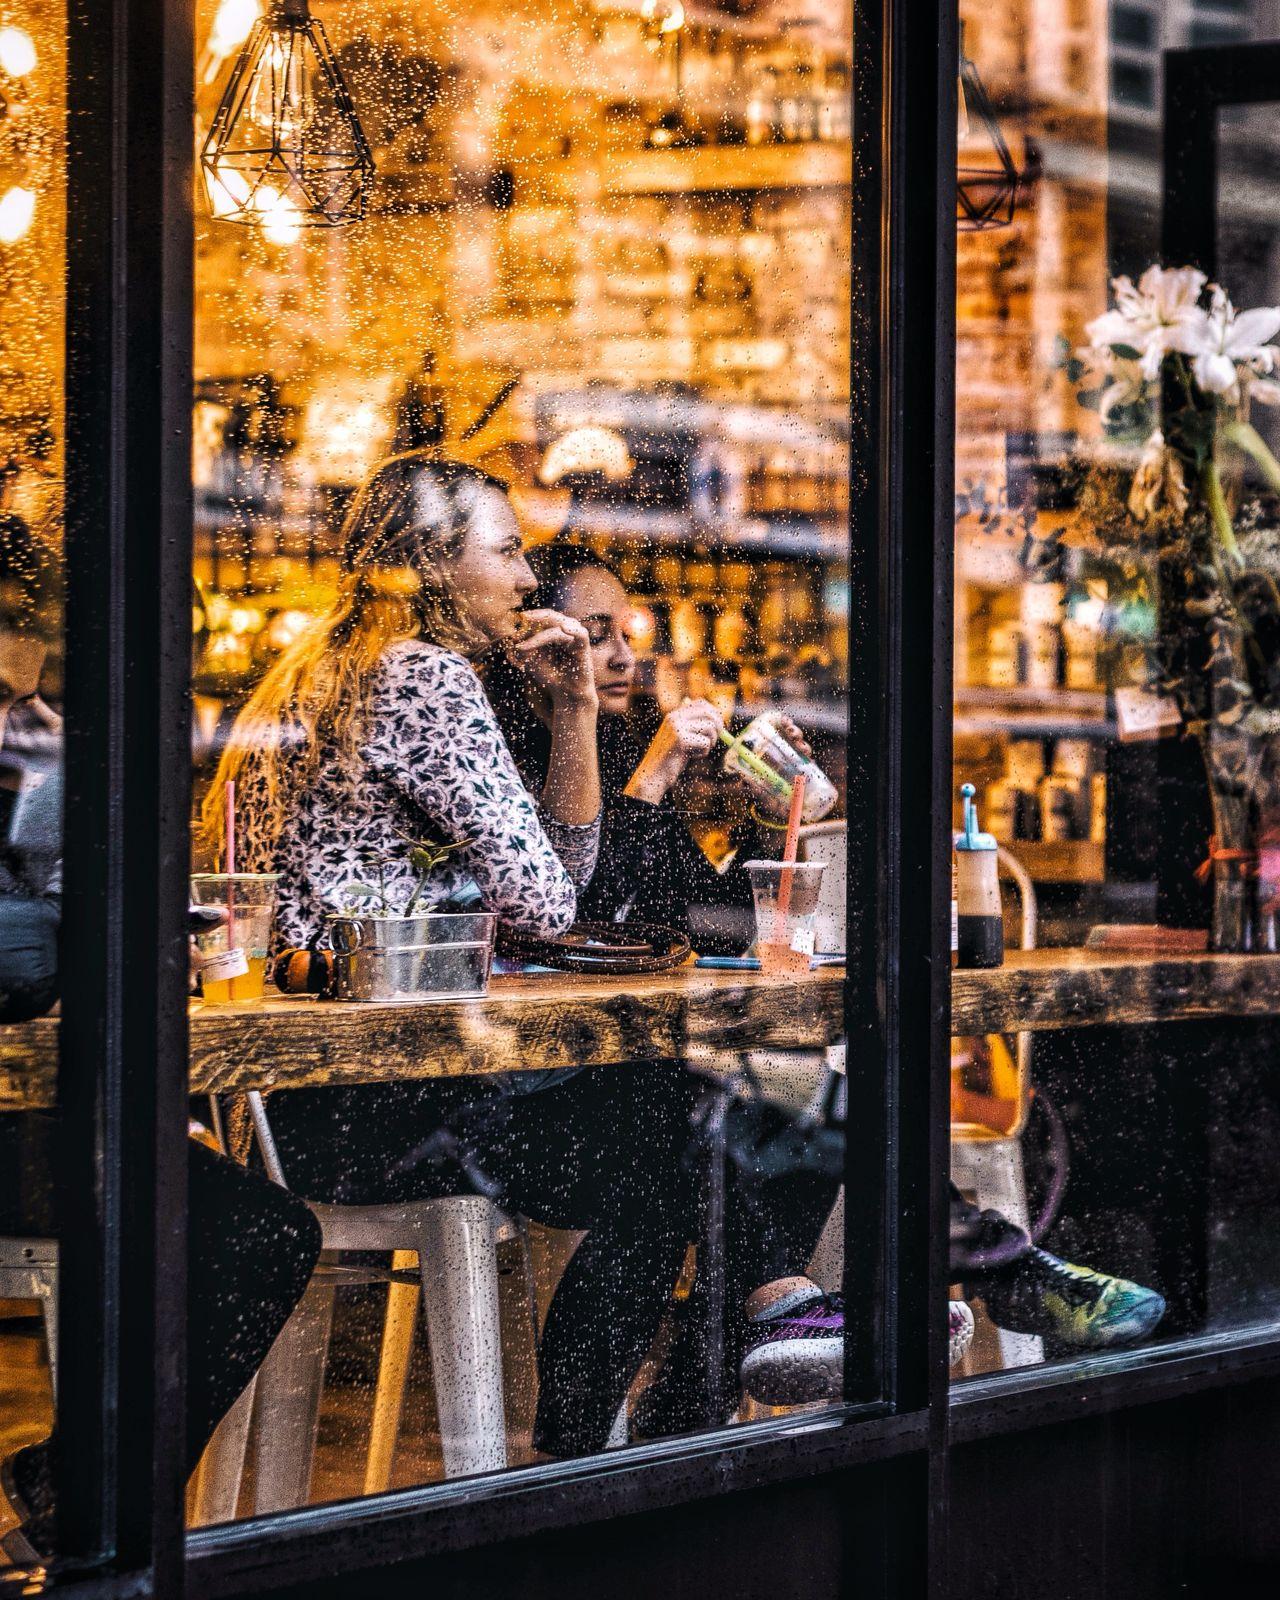 Enjoy The New Normal Glass - Material Looking Through Window Window City Abstractart EyeEm Best Shots